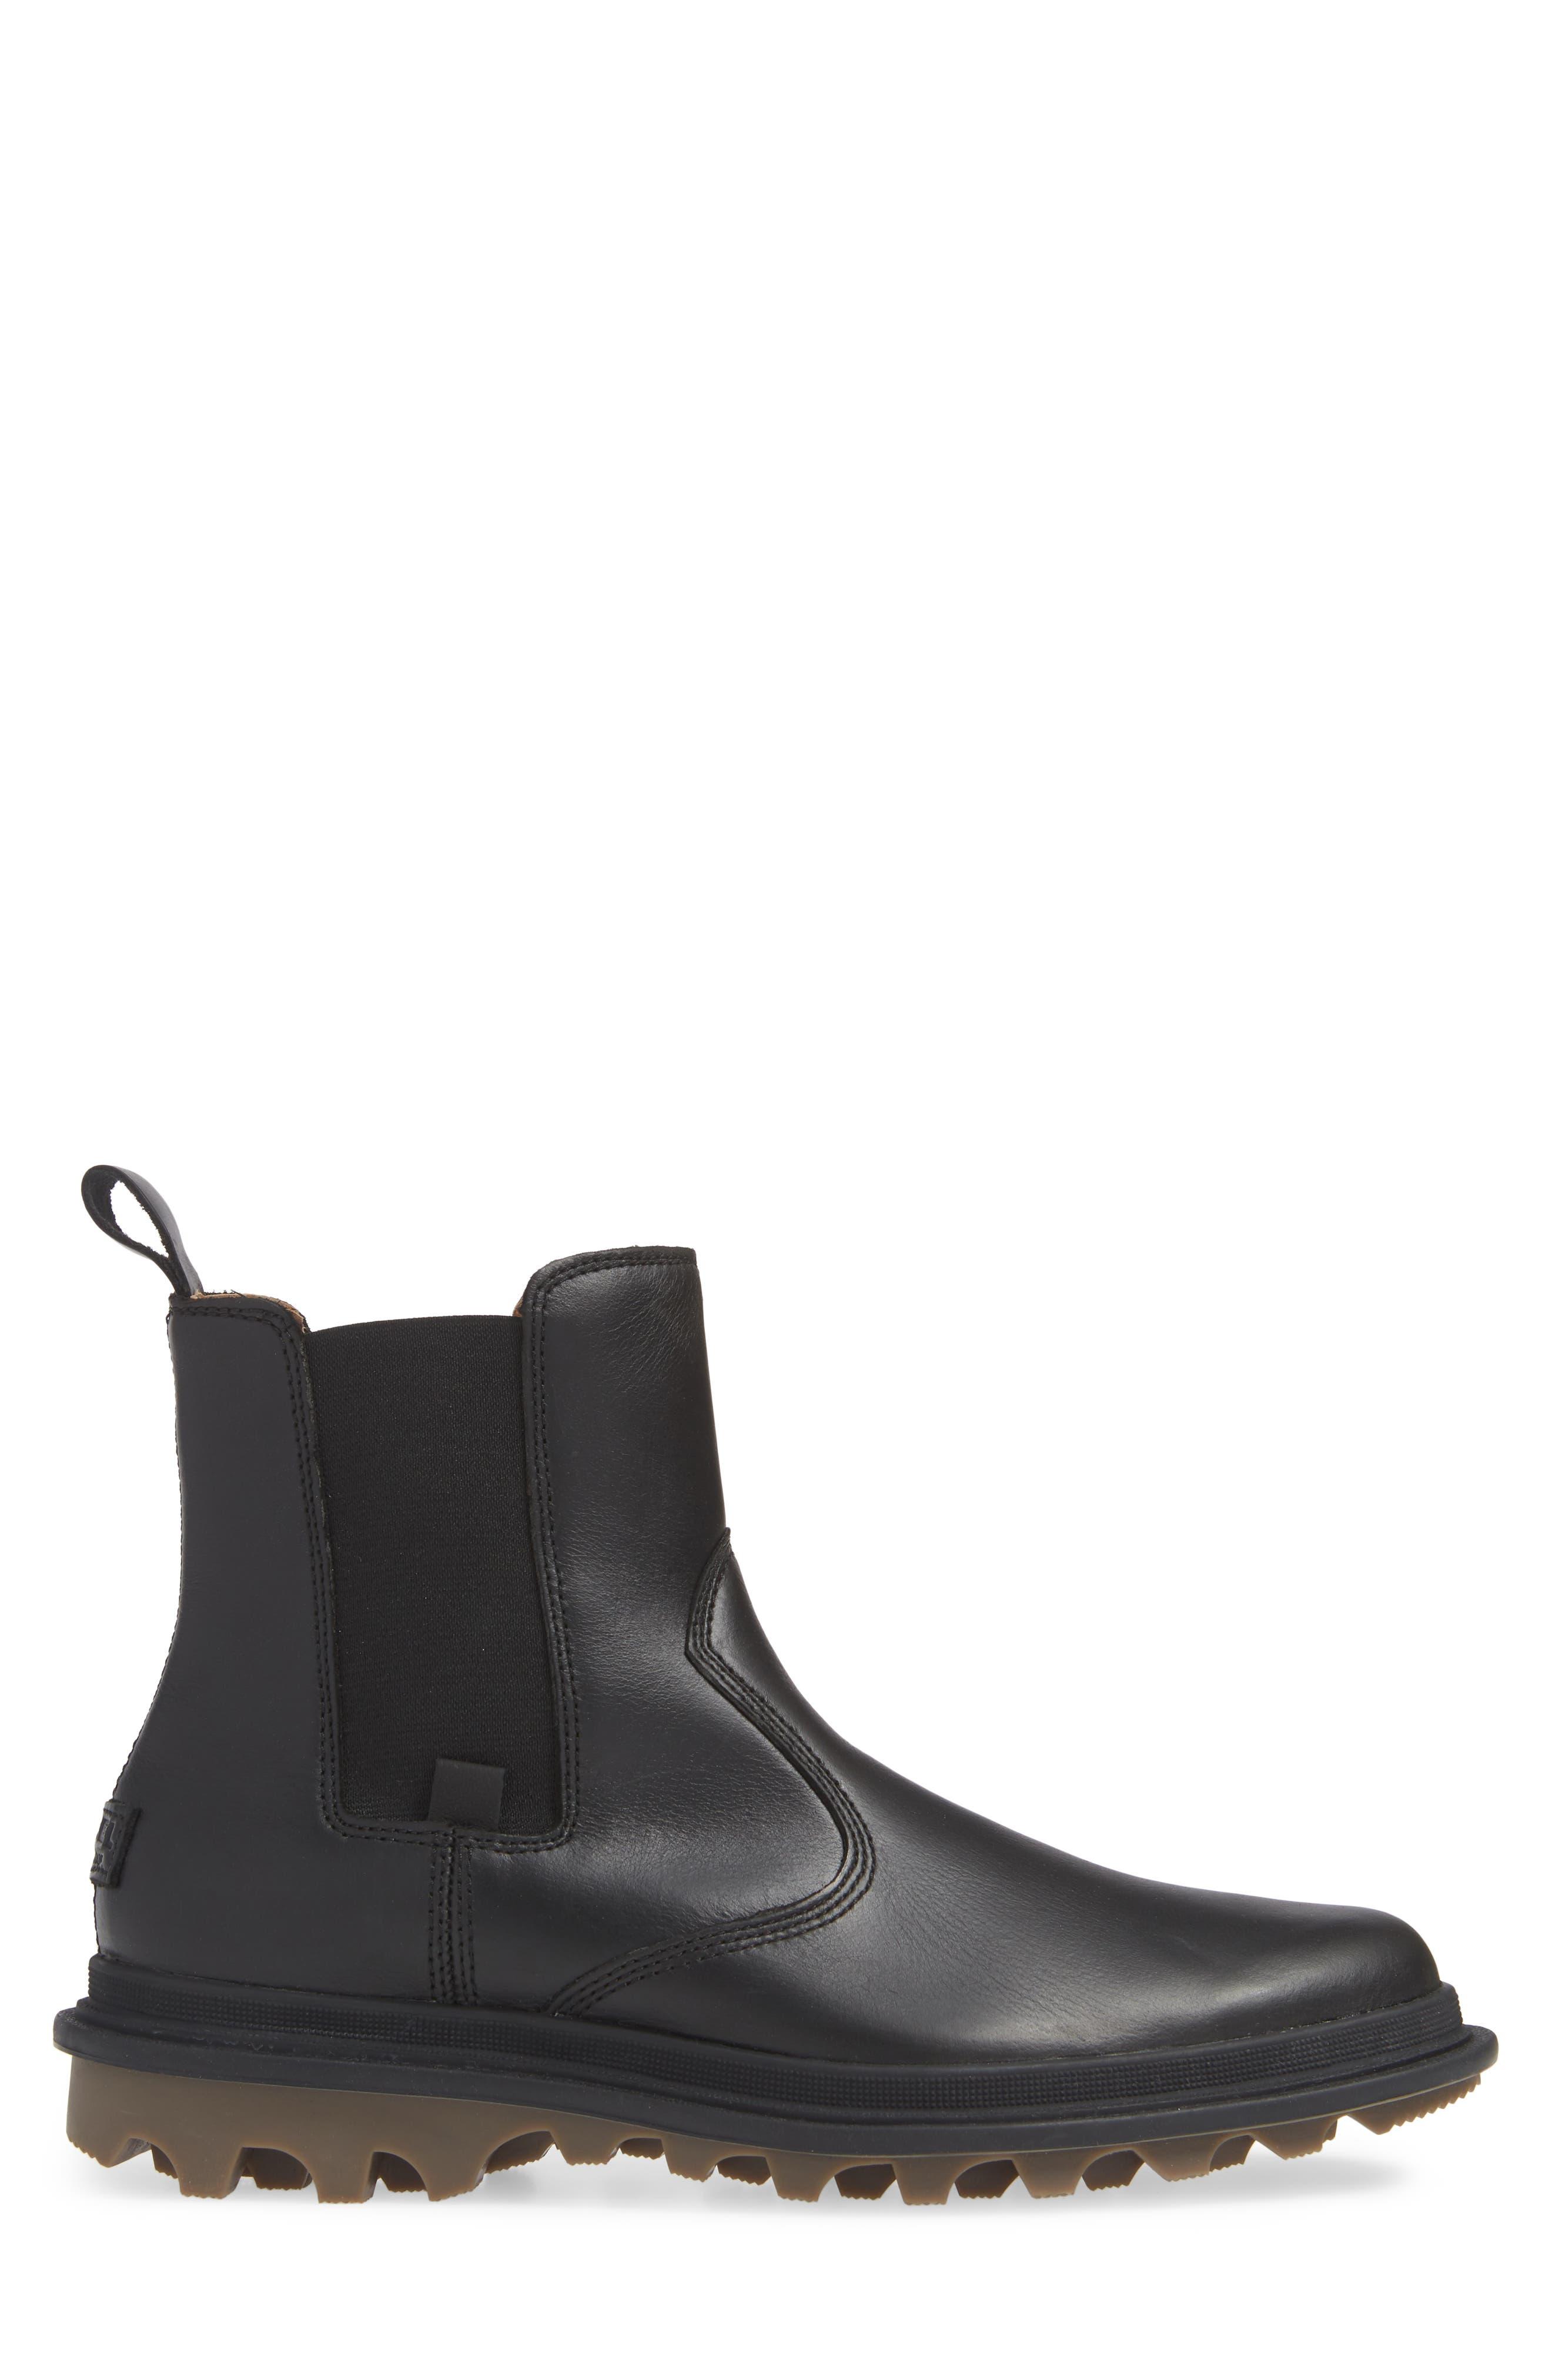 SOREL,                             Ace Waterproof Chelsea Boot,                             Alternate thumbnail 3, color,                             010